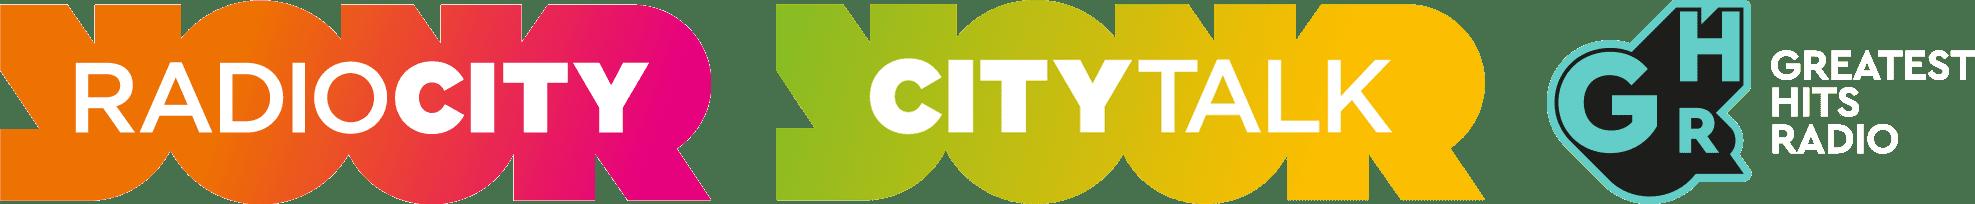 Radio City, City Talk, Greatest Hits Radio